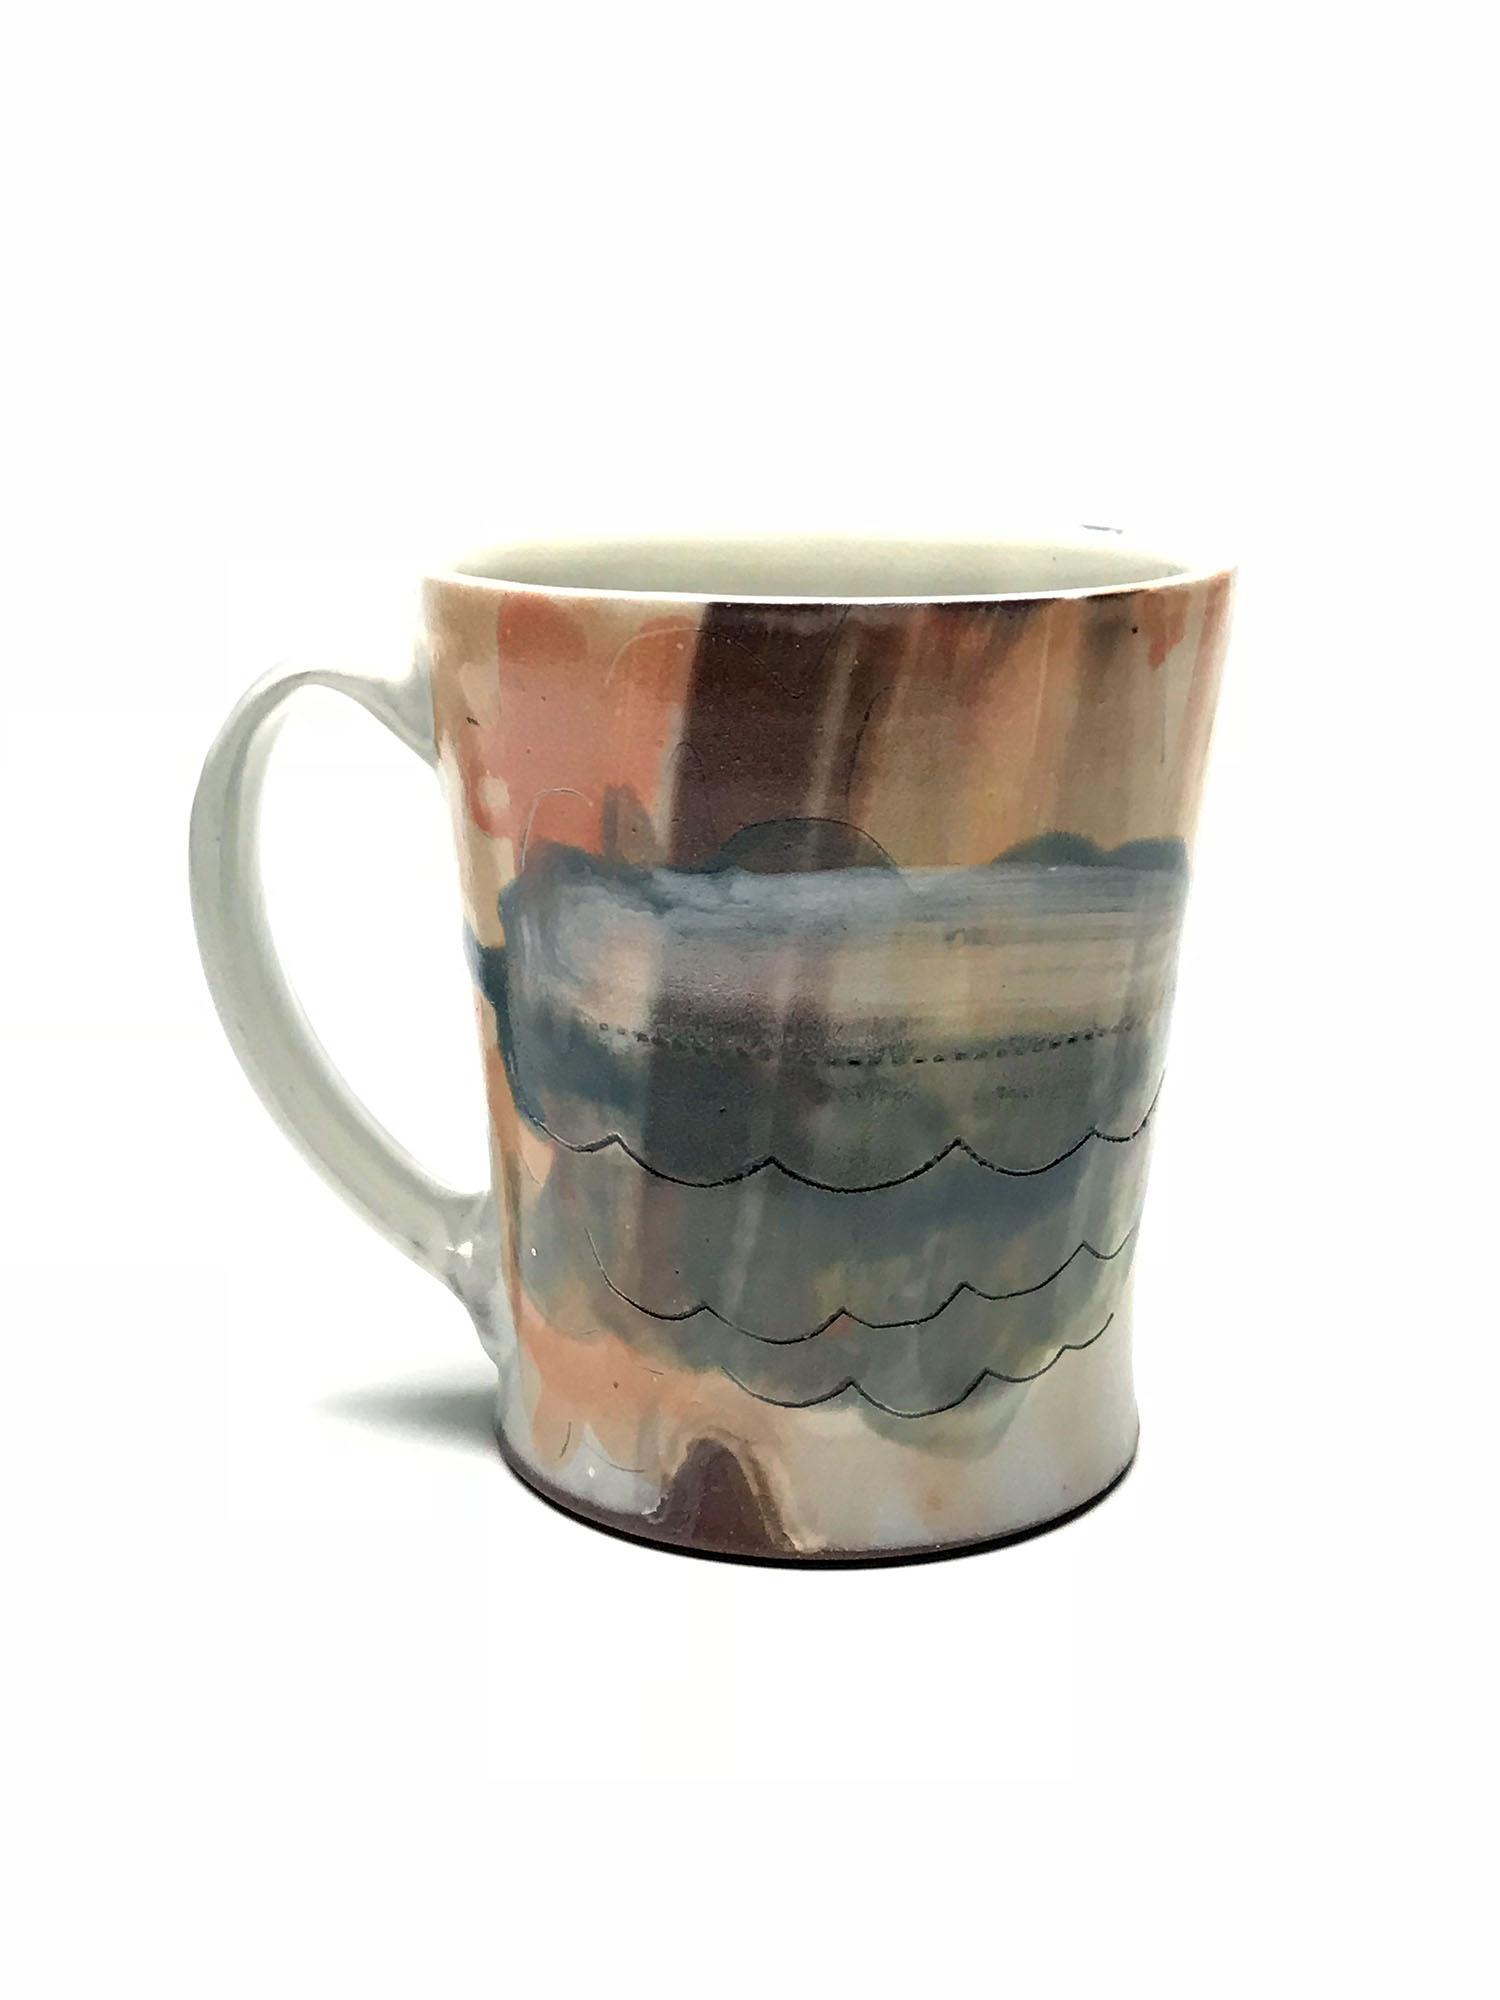 Mug  Earthen red clay, slips, underglaze, glaze